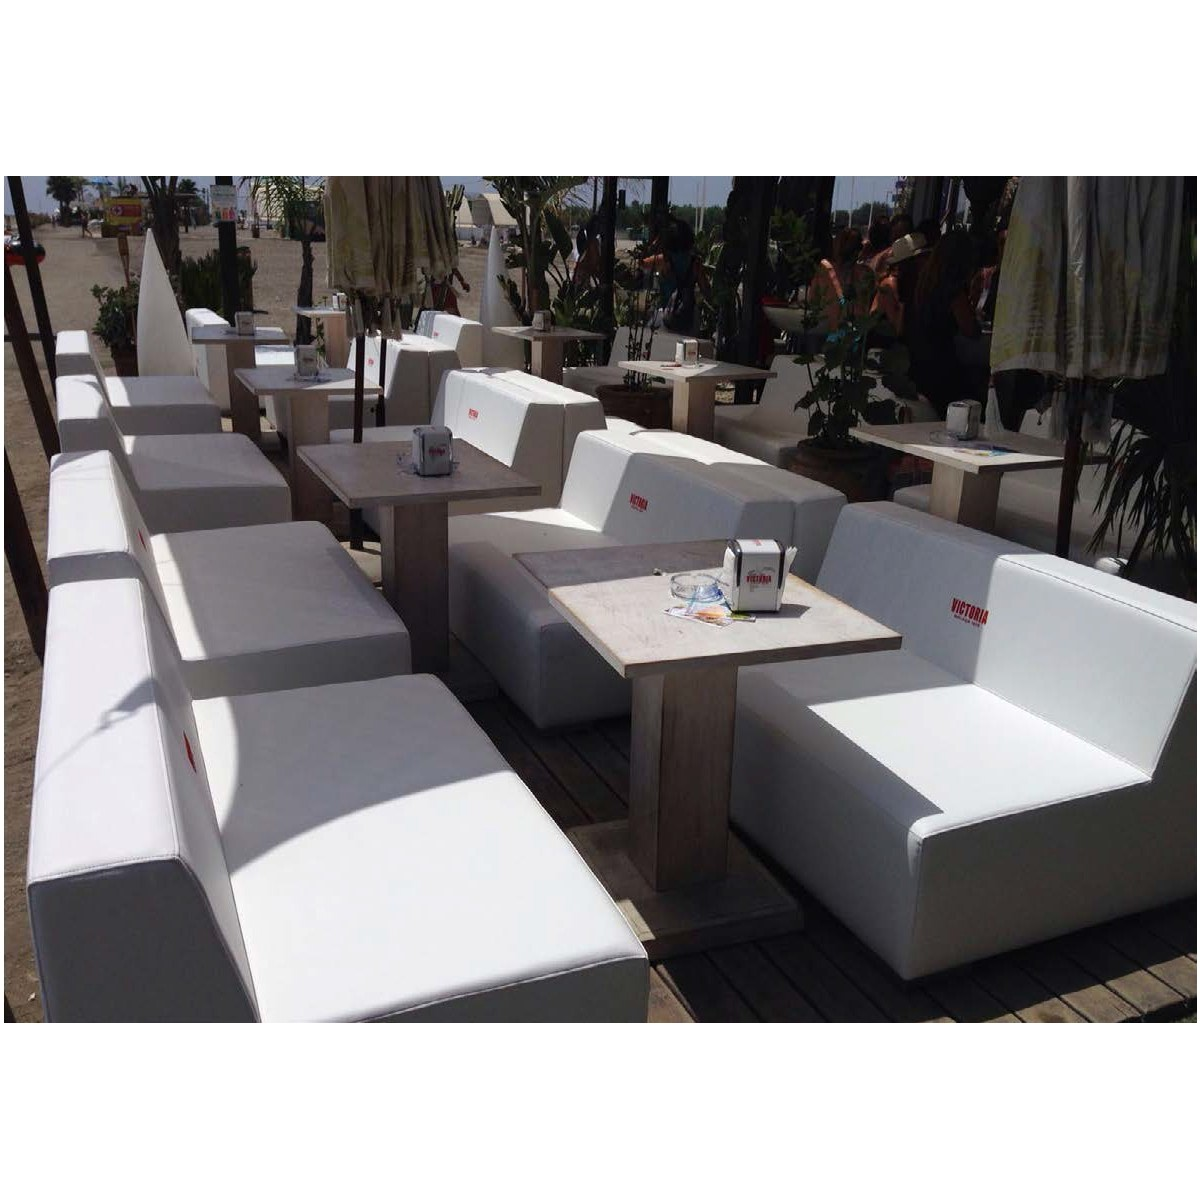 Sofa esquinero con tela de barco de exterior marbella for Tela sofa exterior